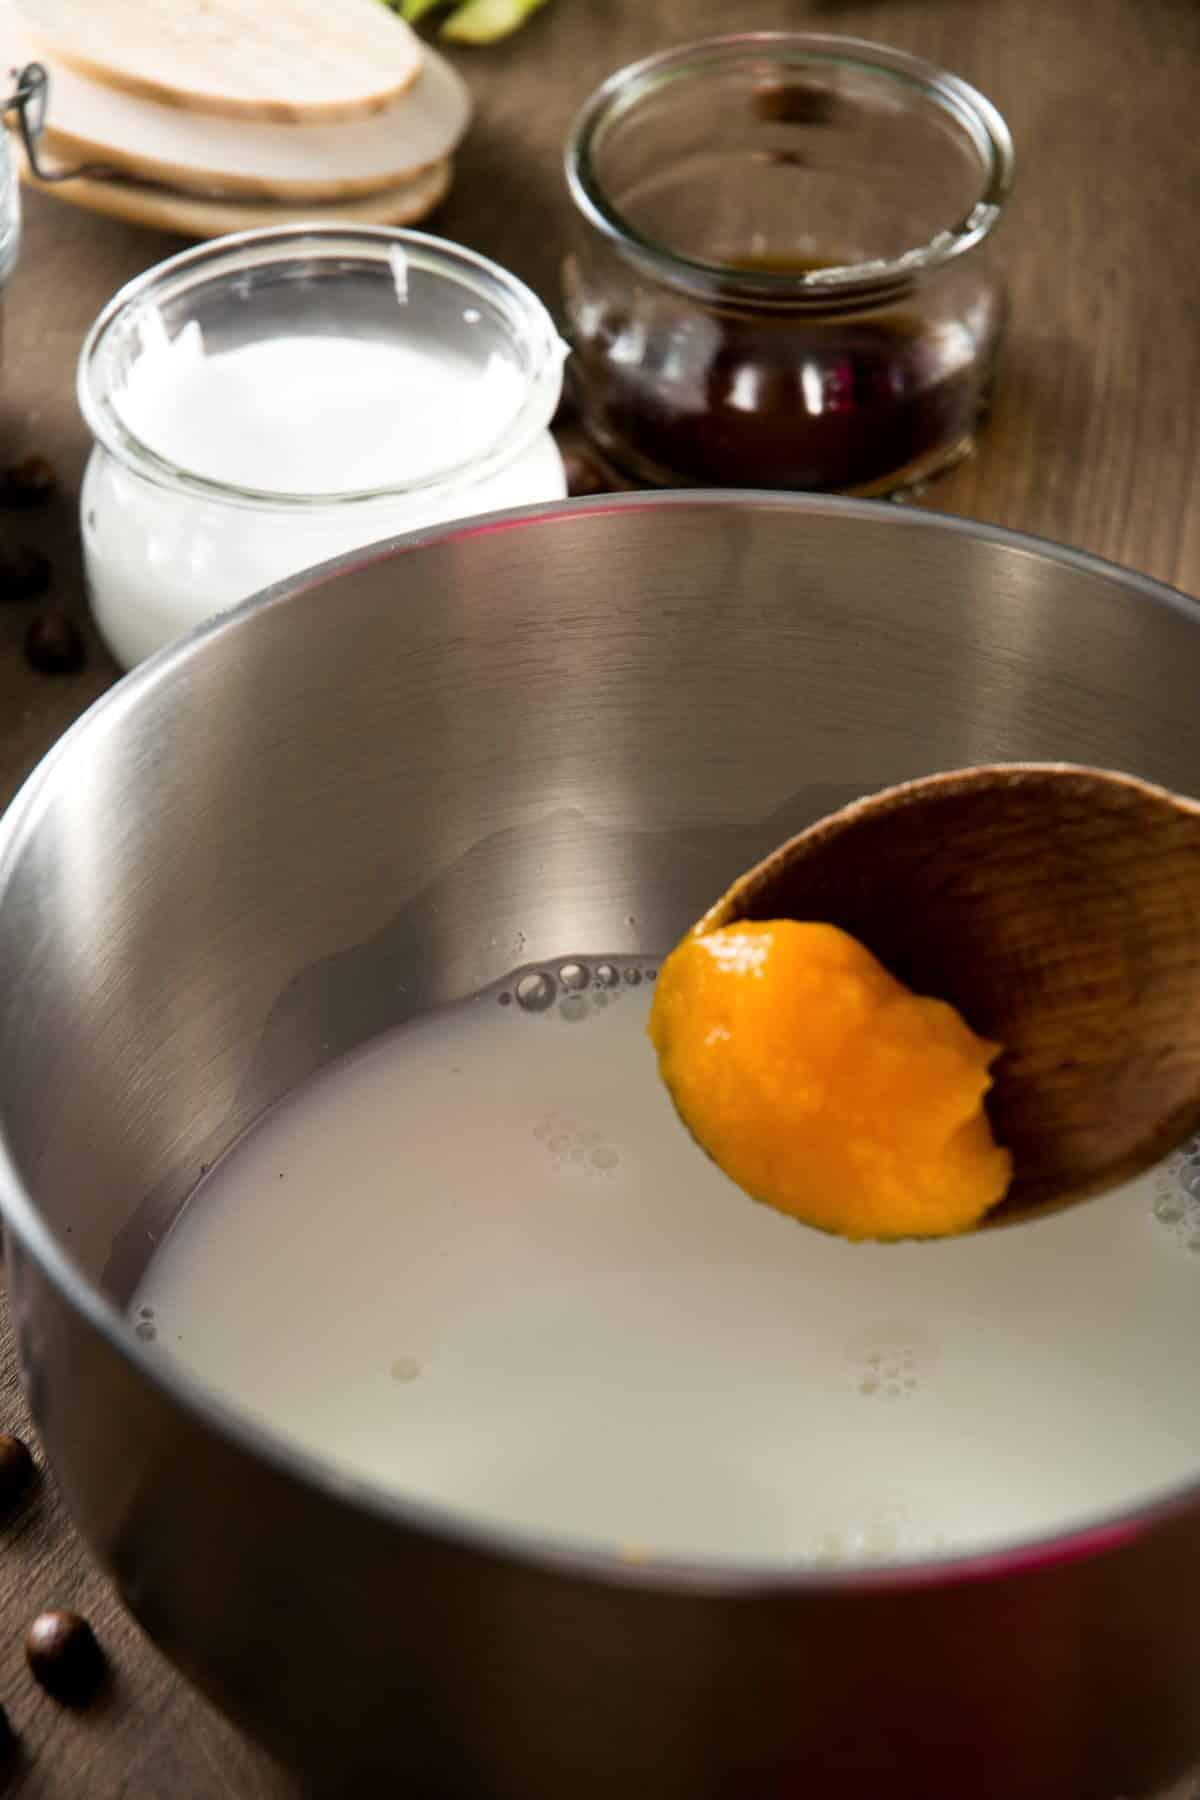 Pumpkin puree on a spoon and milk in a saucepan.